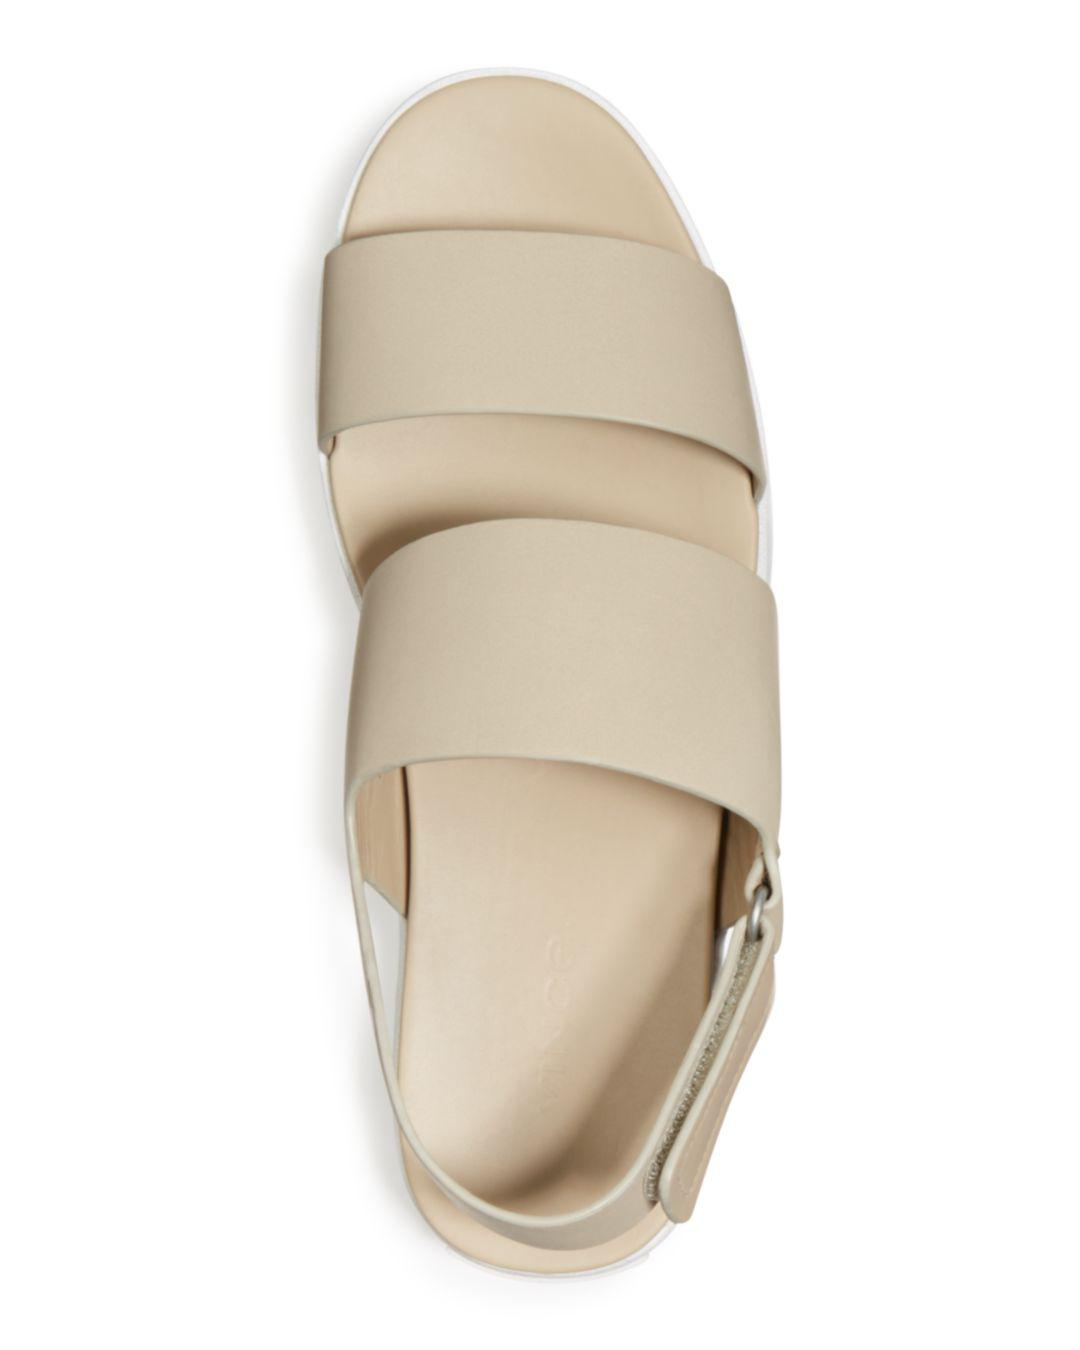 1577c463101 Vince - Multicolor Women s Westport Leather Platform Sandals - Lyst. View  fullscreen